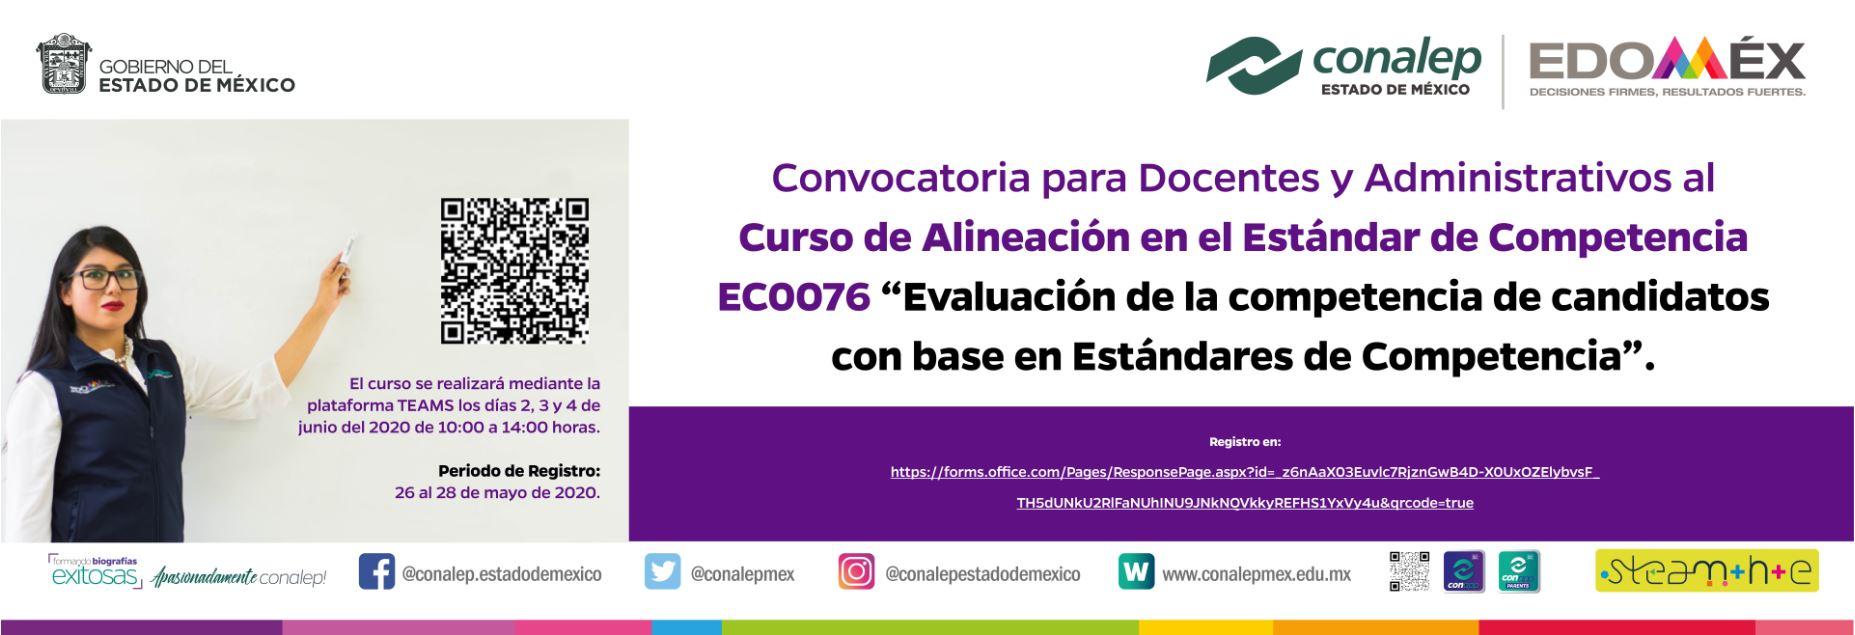 BannerAlineacinEstandarDeCompetenciaEC0076